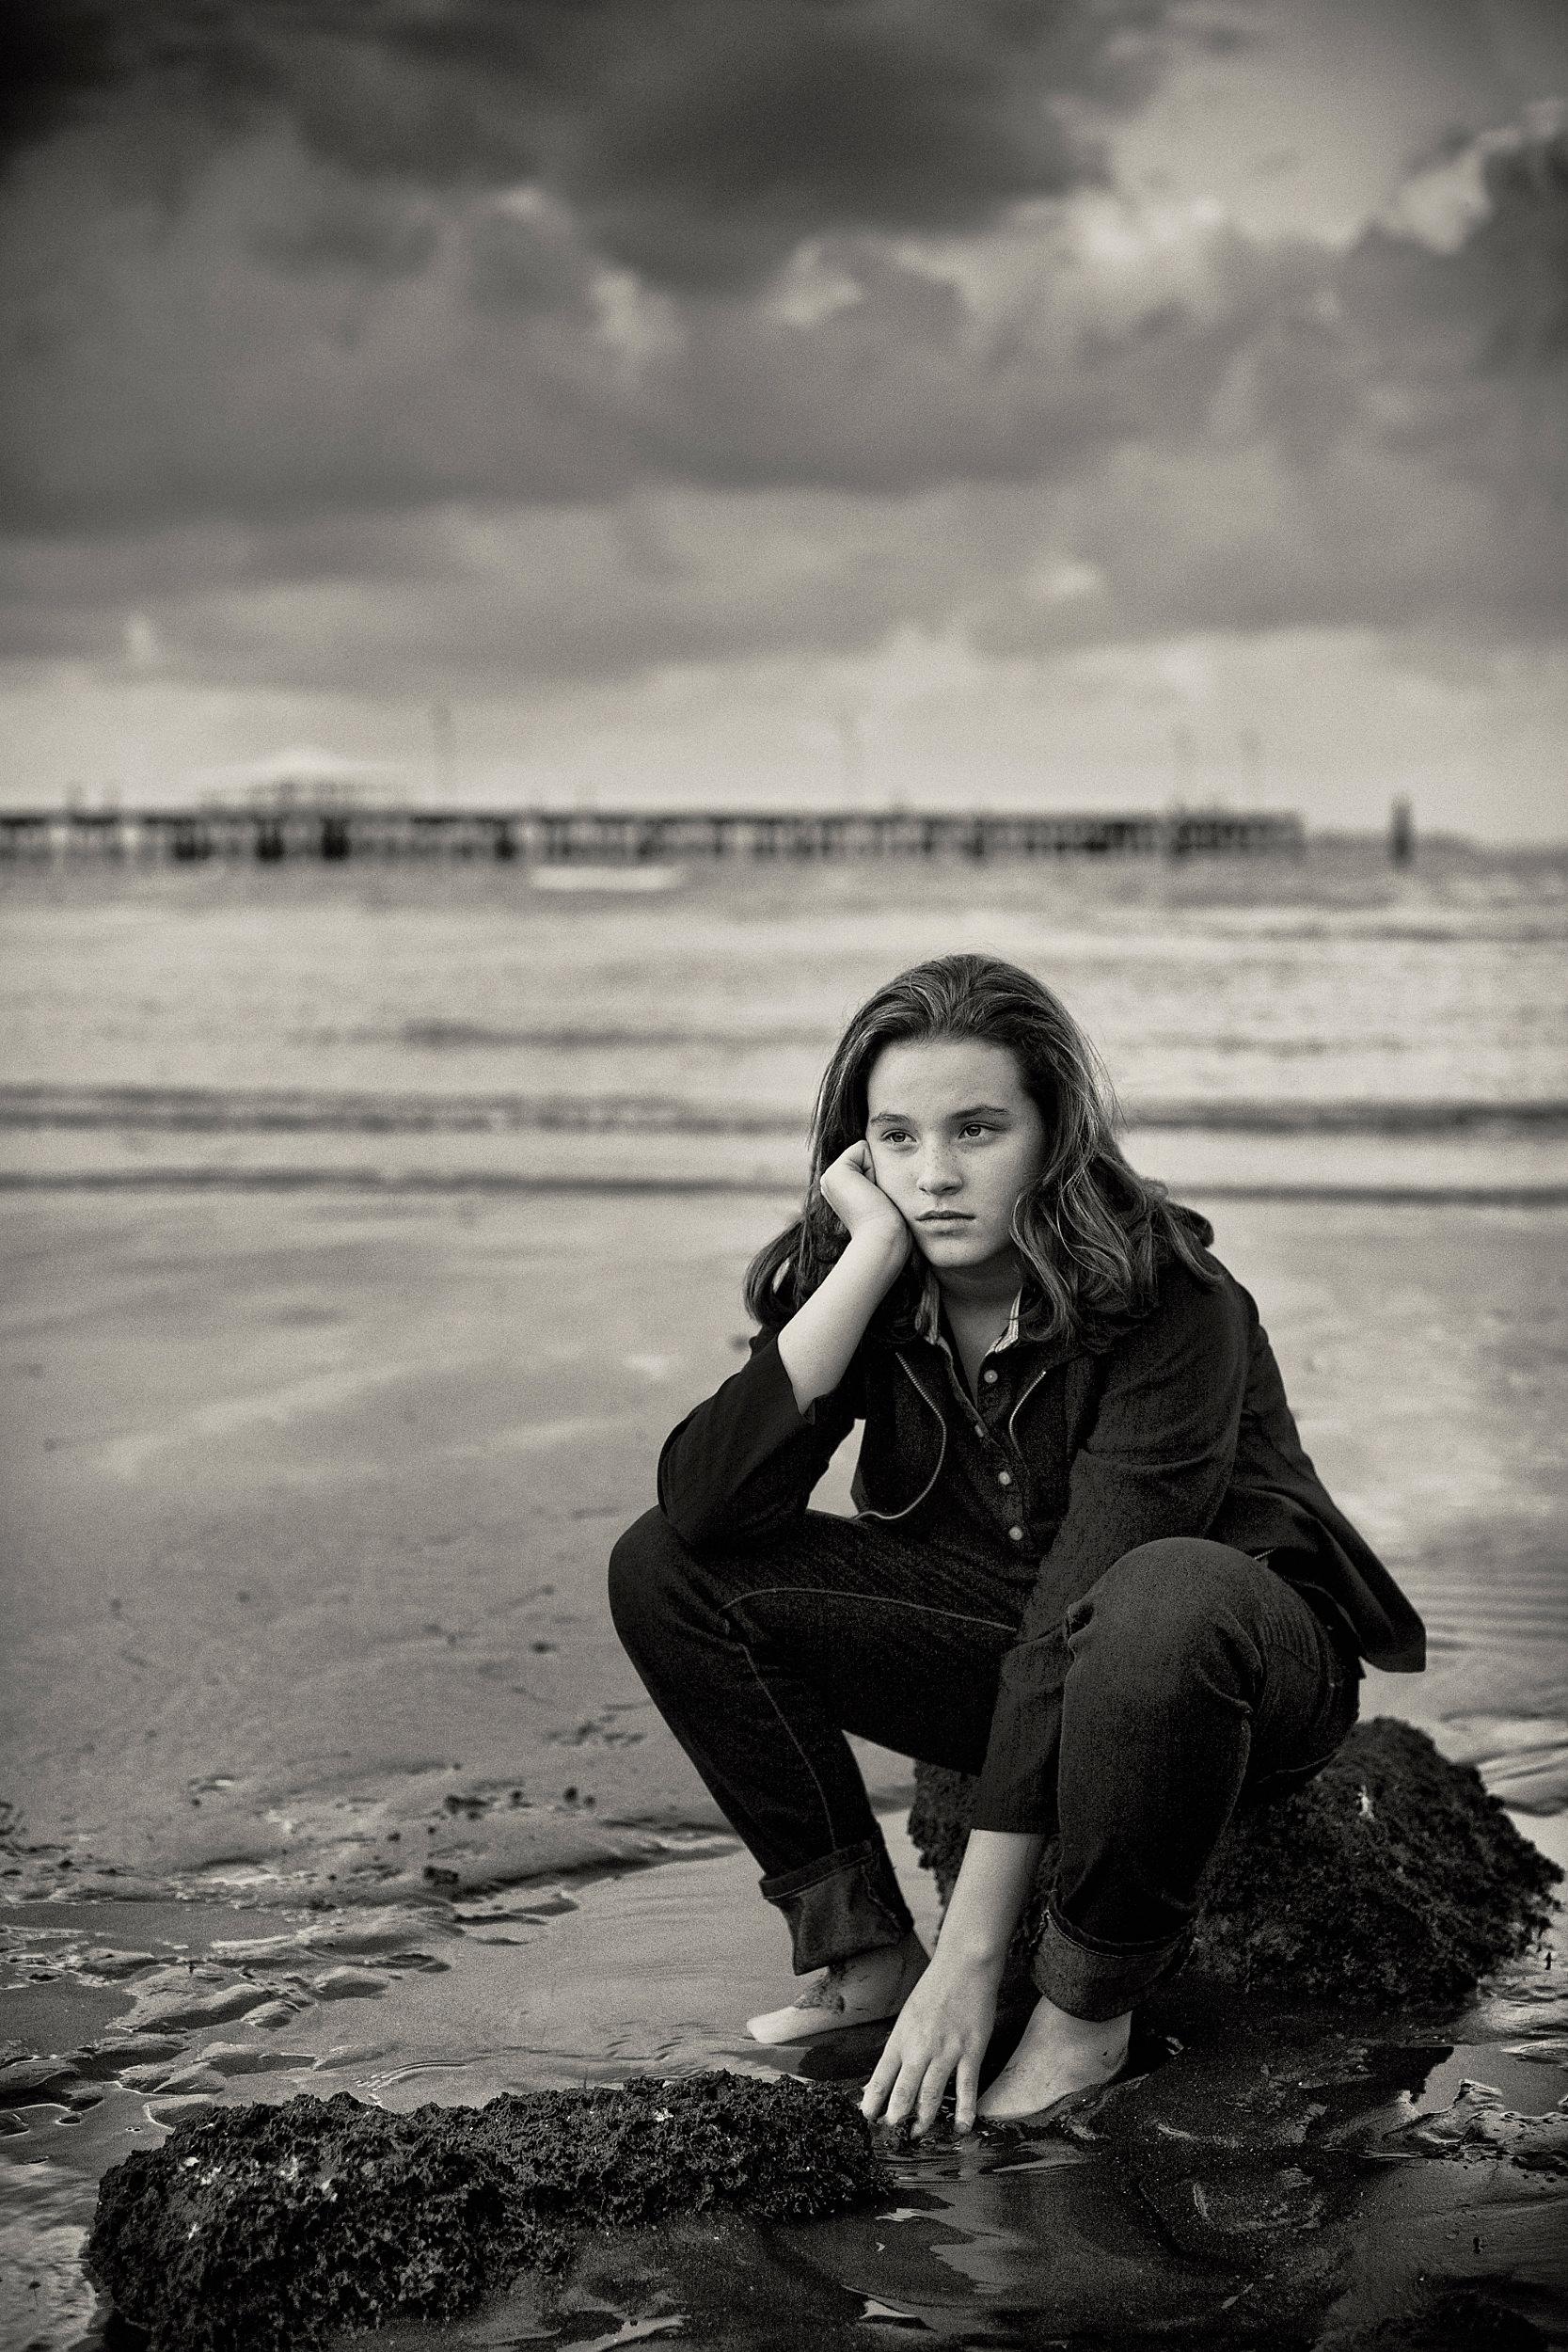 Tutorials-pensive-mood-portrait-shorncliffe-beach.jpg